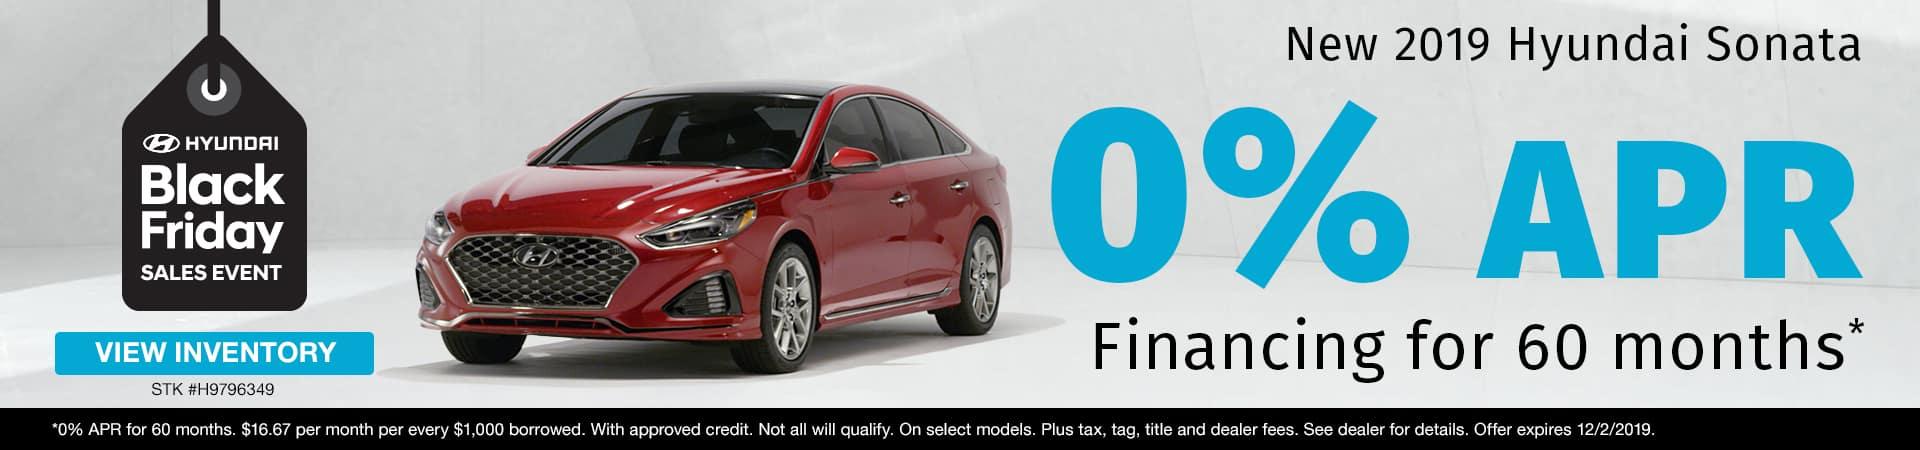 Get 0% APR Financing on a new 2019 Hyundai Sonata in Murfreesboro TN